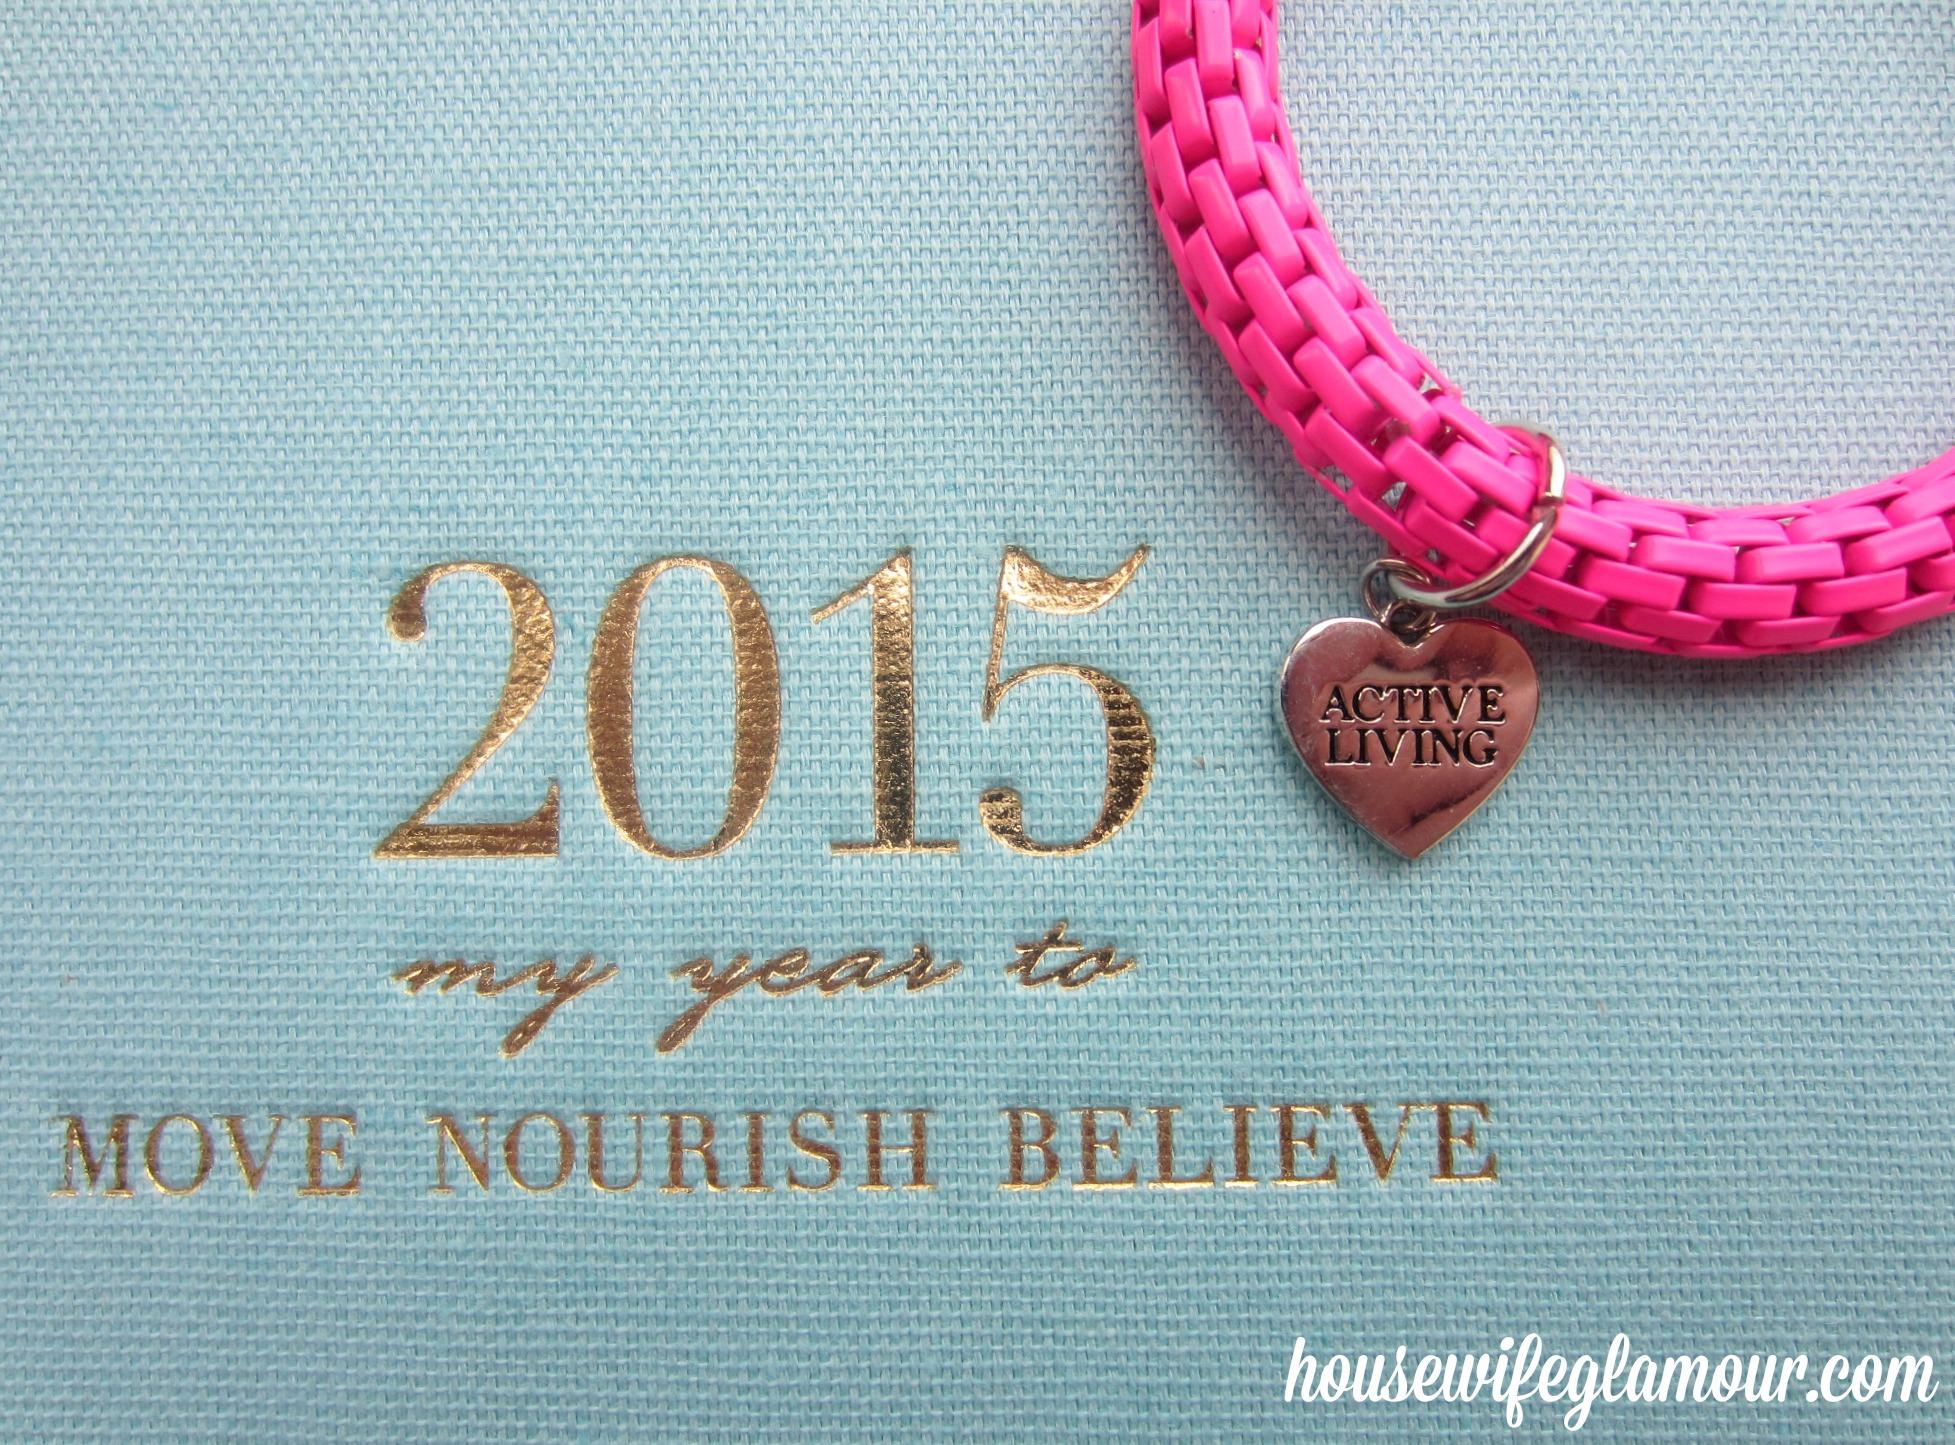 Lorna Jane Move Nourish Believe diary 2015